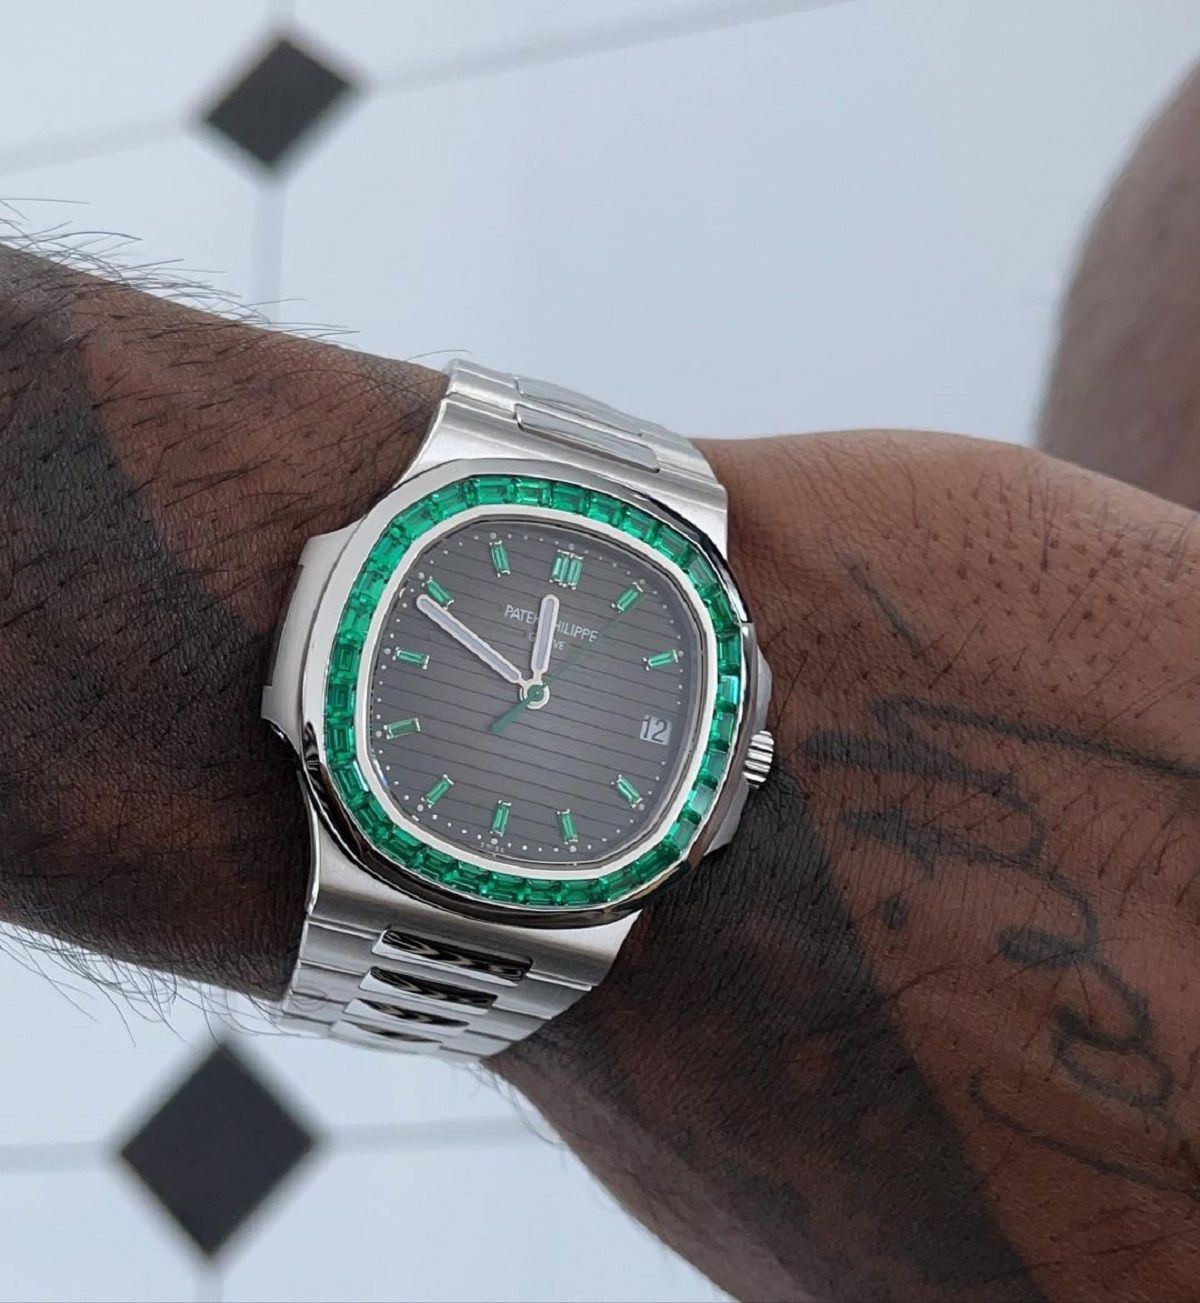 Hardik Pandya wrist watch